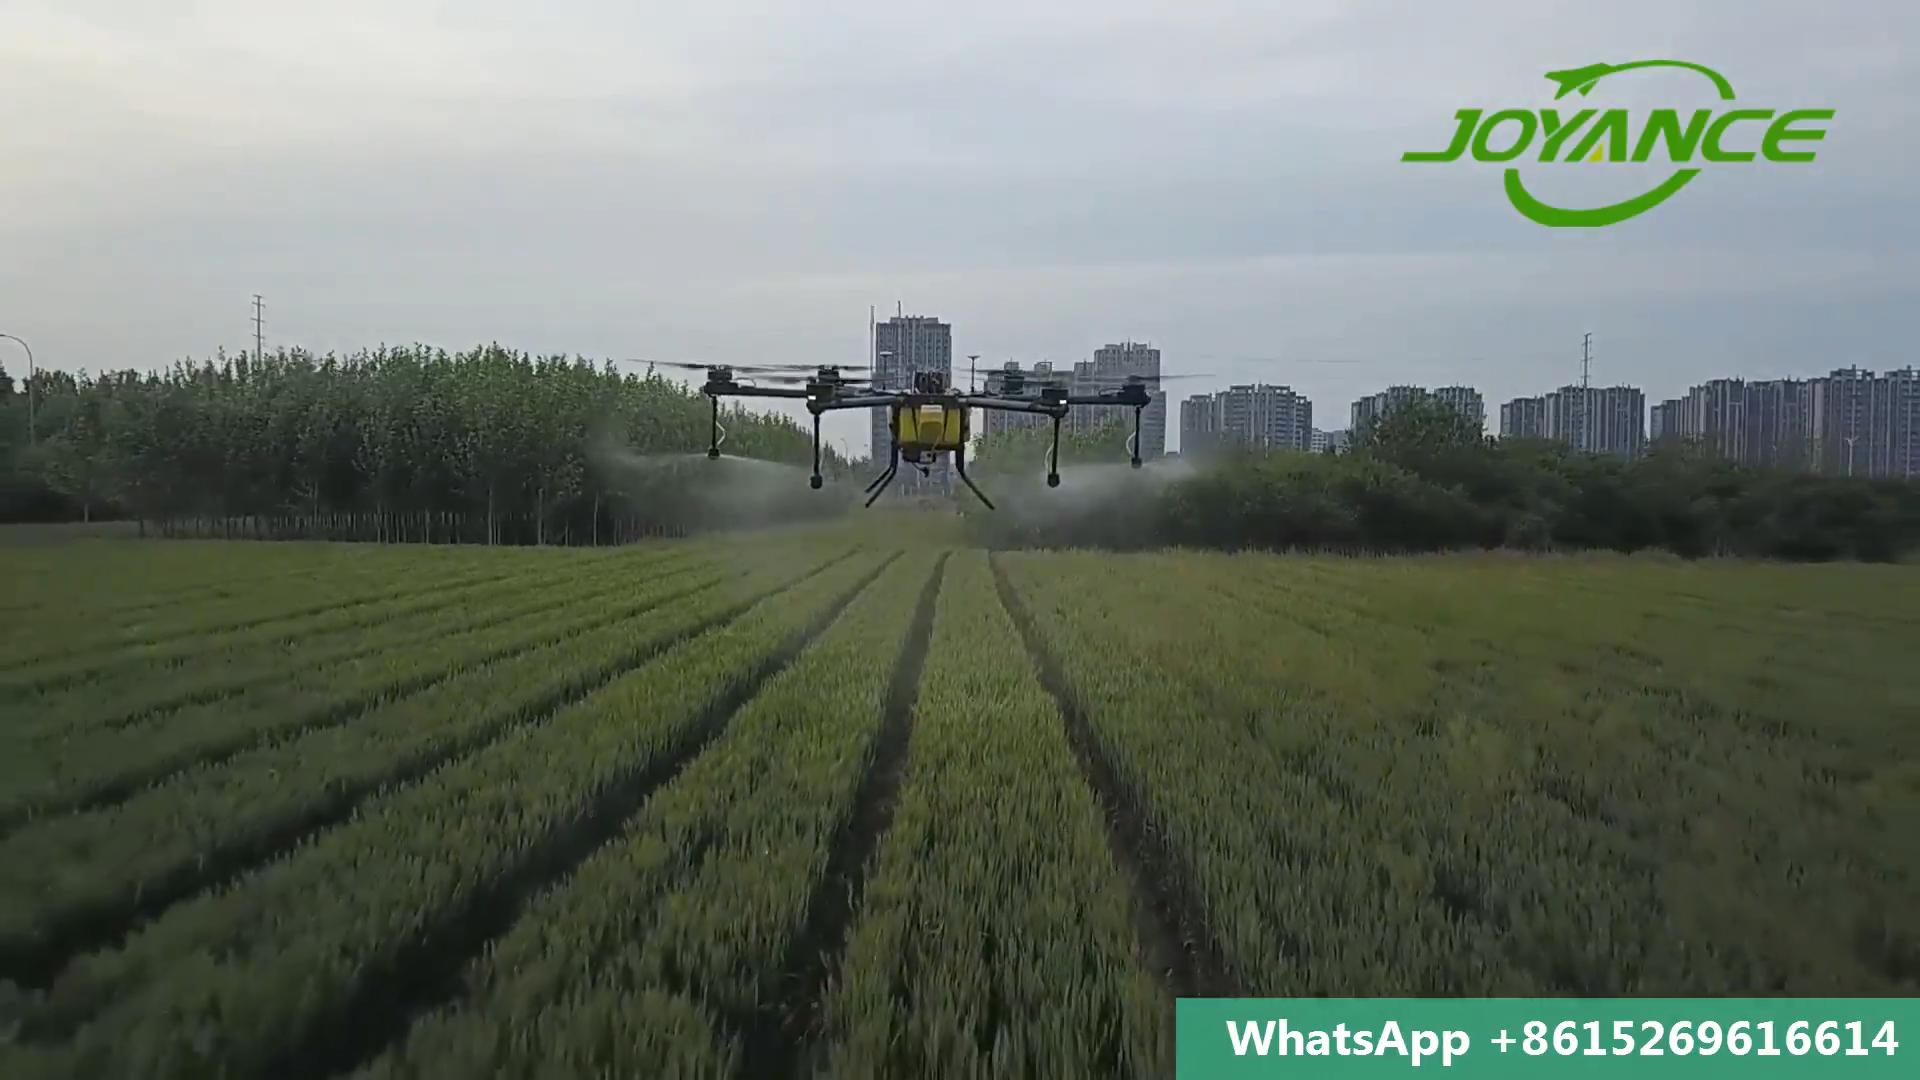 2019 Tinggi Efisien 20 Liter UAV Pertanian Drone Tanaman Sprayer/Pestisida Helikopter/Pesawat Di Pertanian